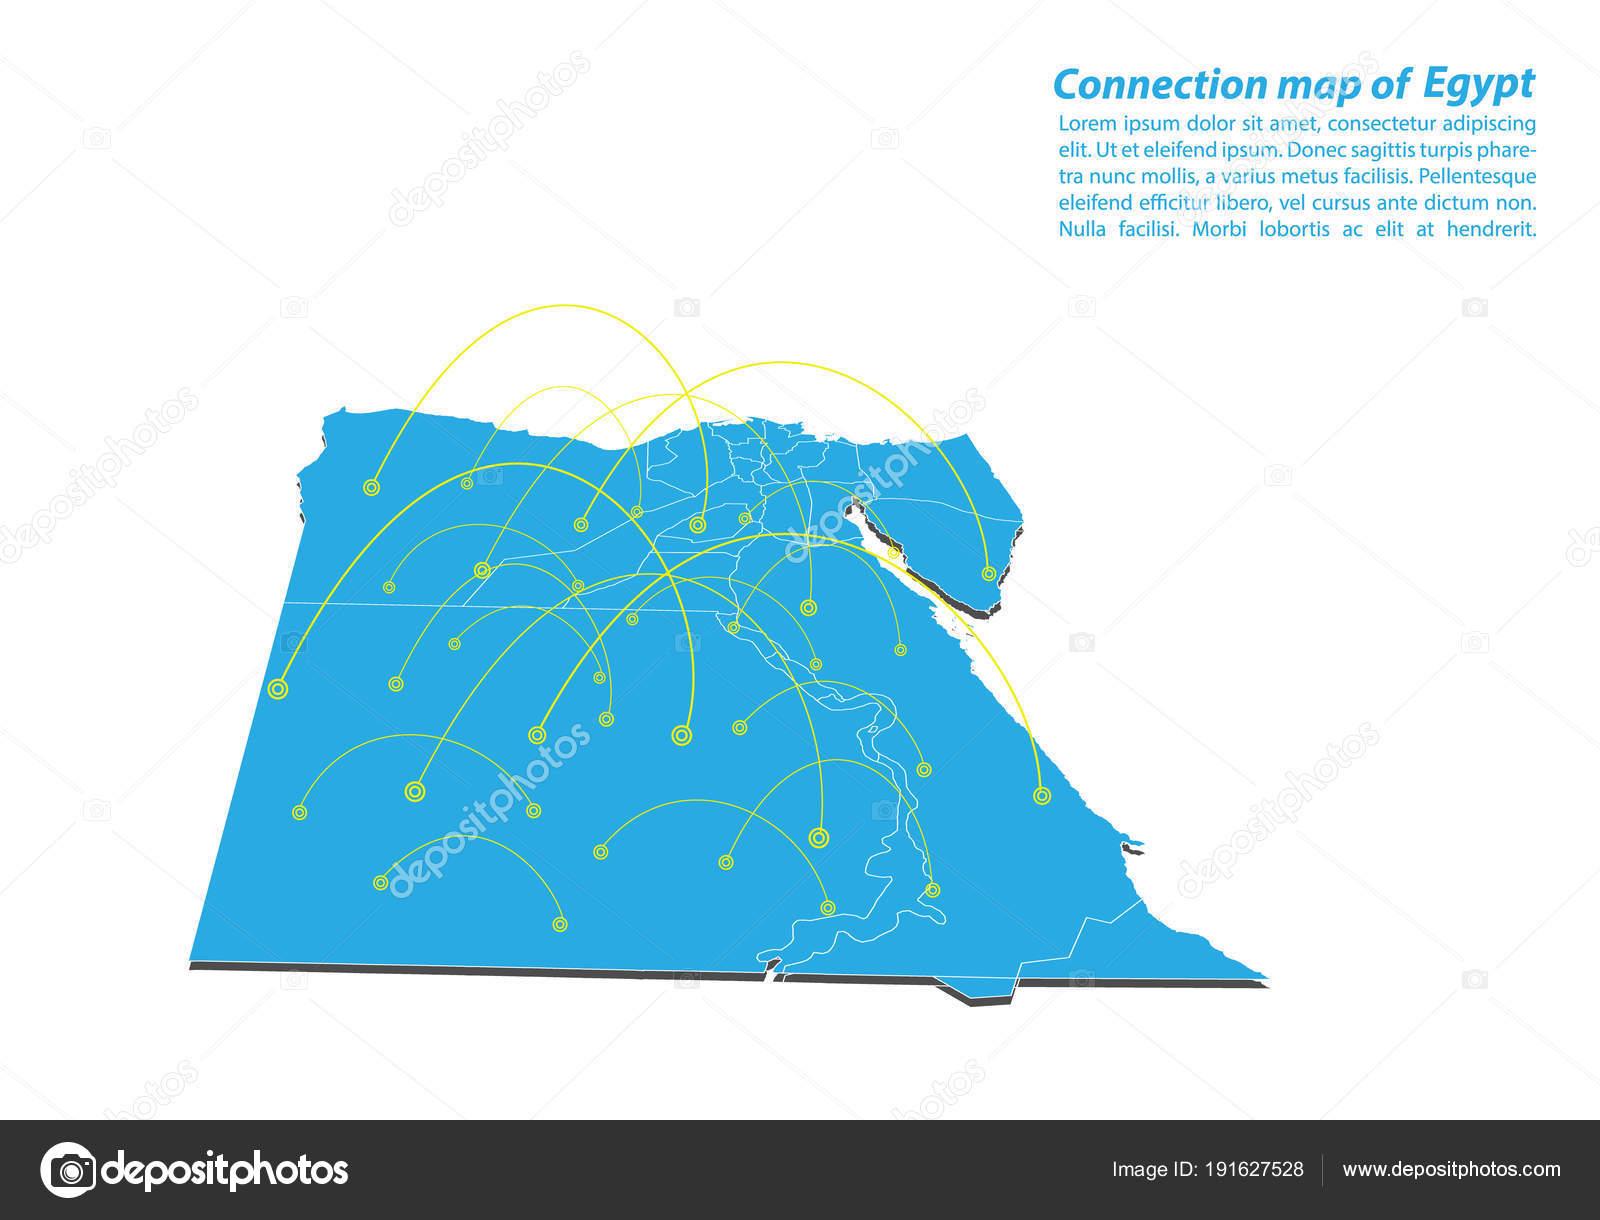 Modern Egypt Map Connections Network Design Best Internet Concept